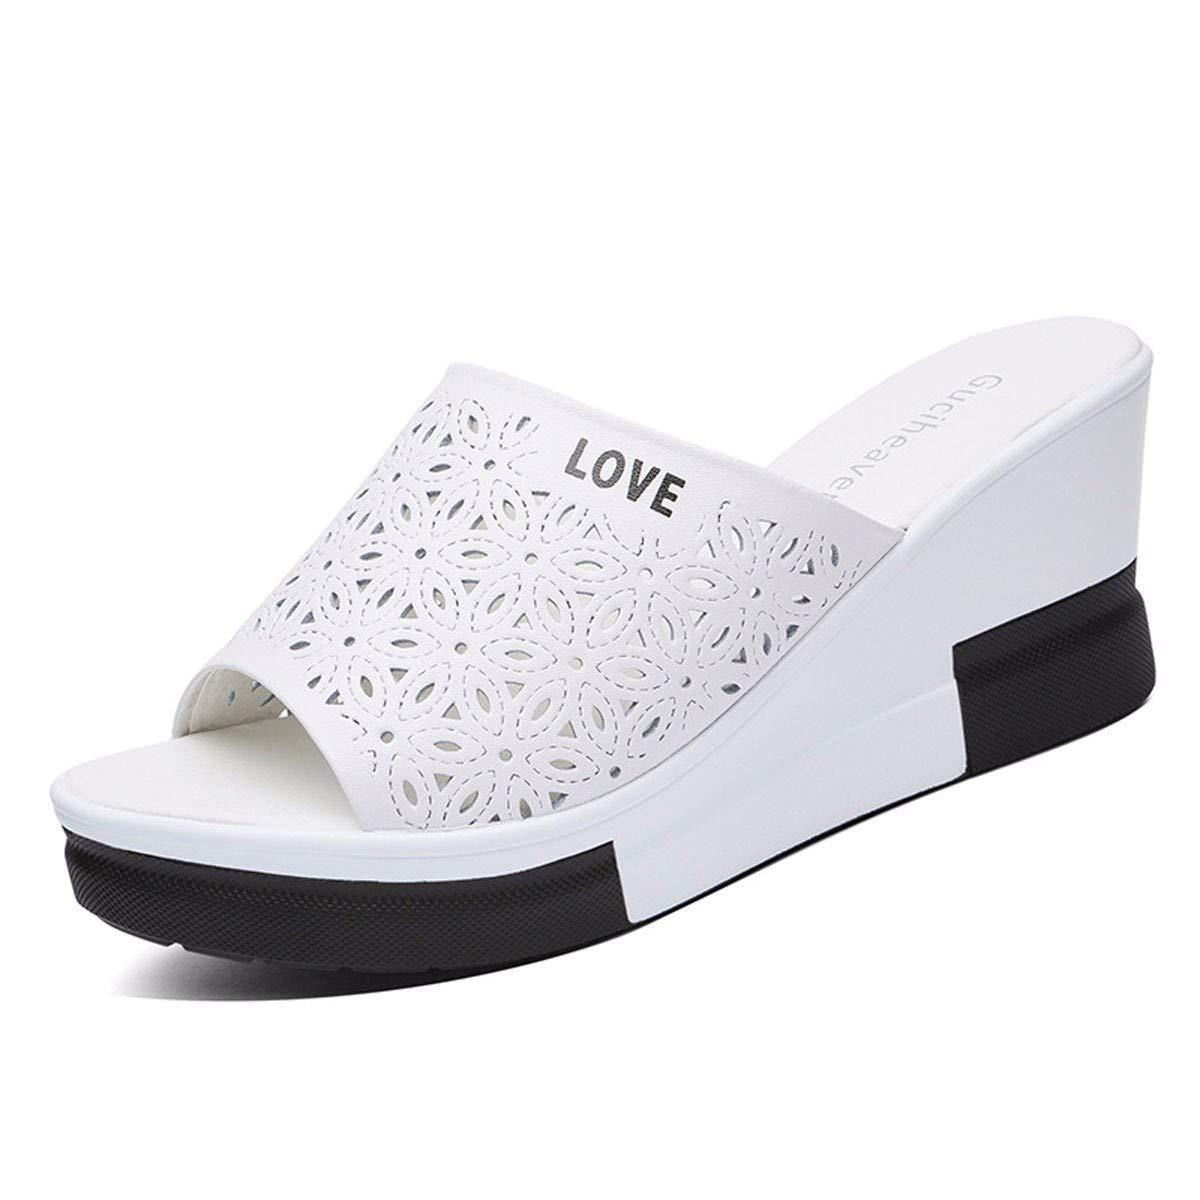 GTVERNH Frauen Schuhe Frauen - Pantoffeln Schrägen Heels Dicke Zusammenbrach Sommer Mode Verschleiß Leder Joker.